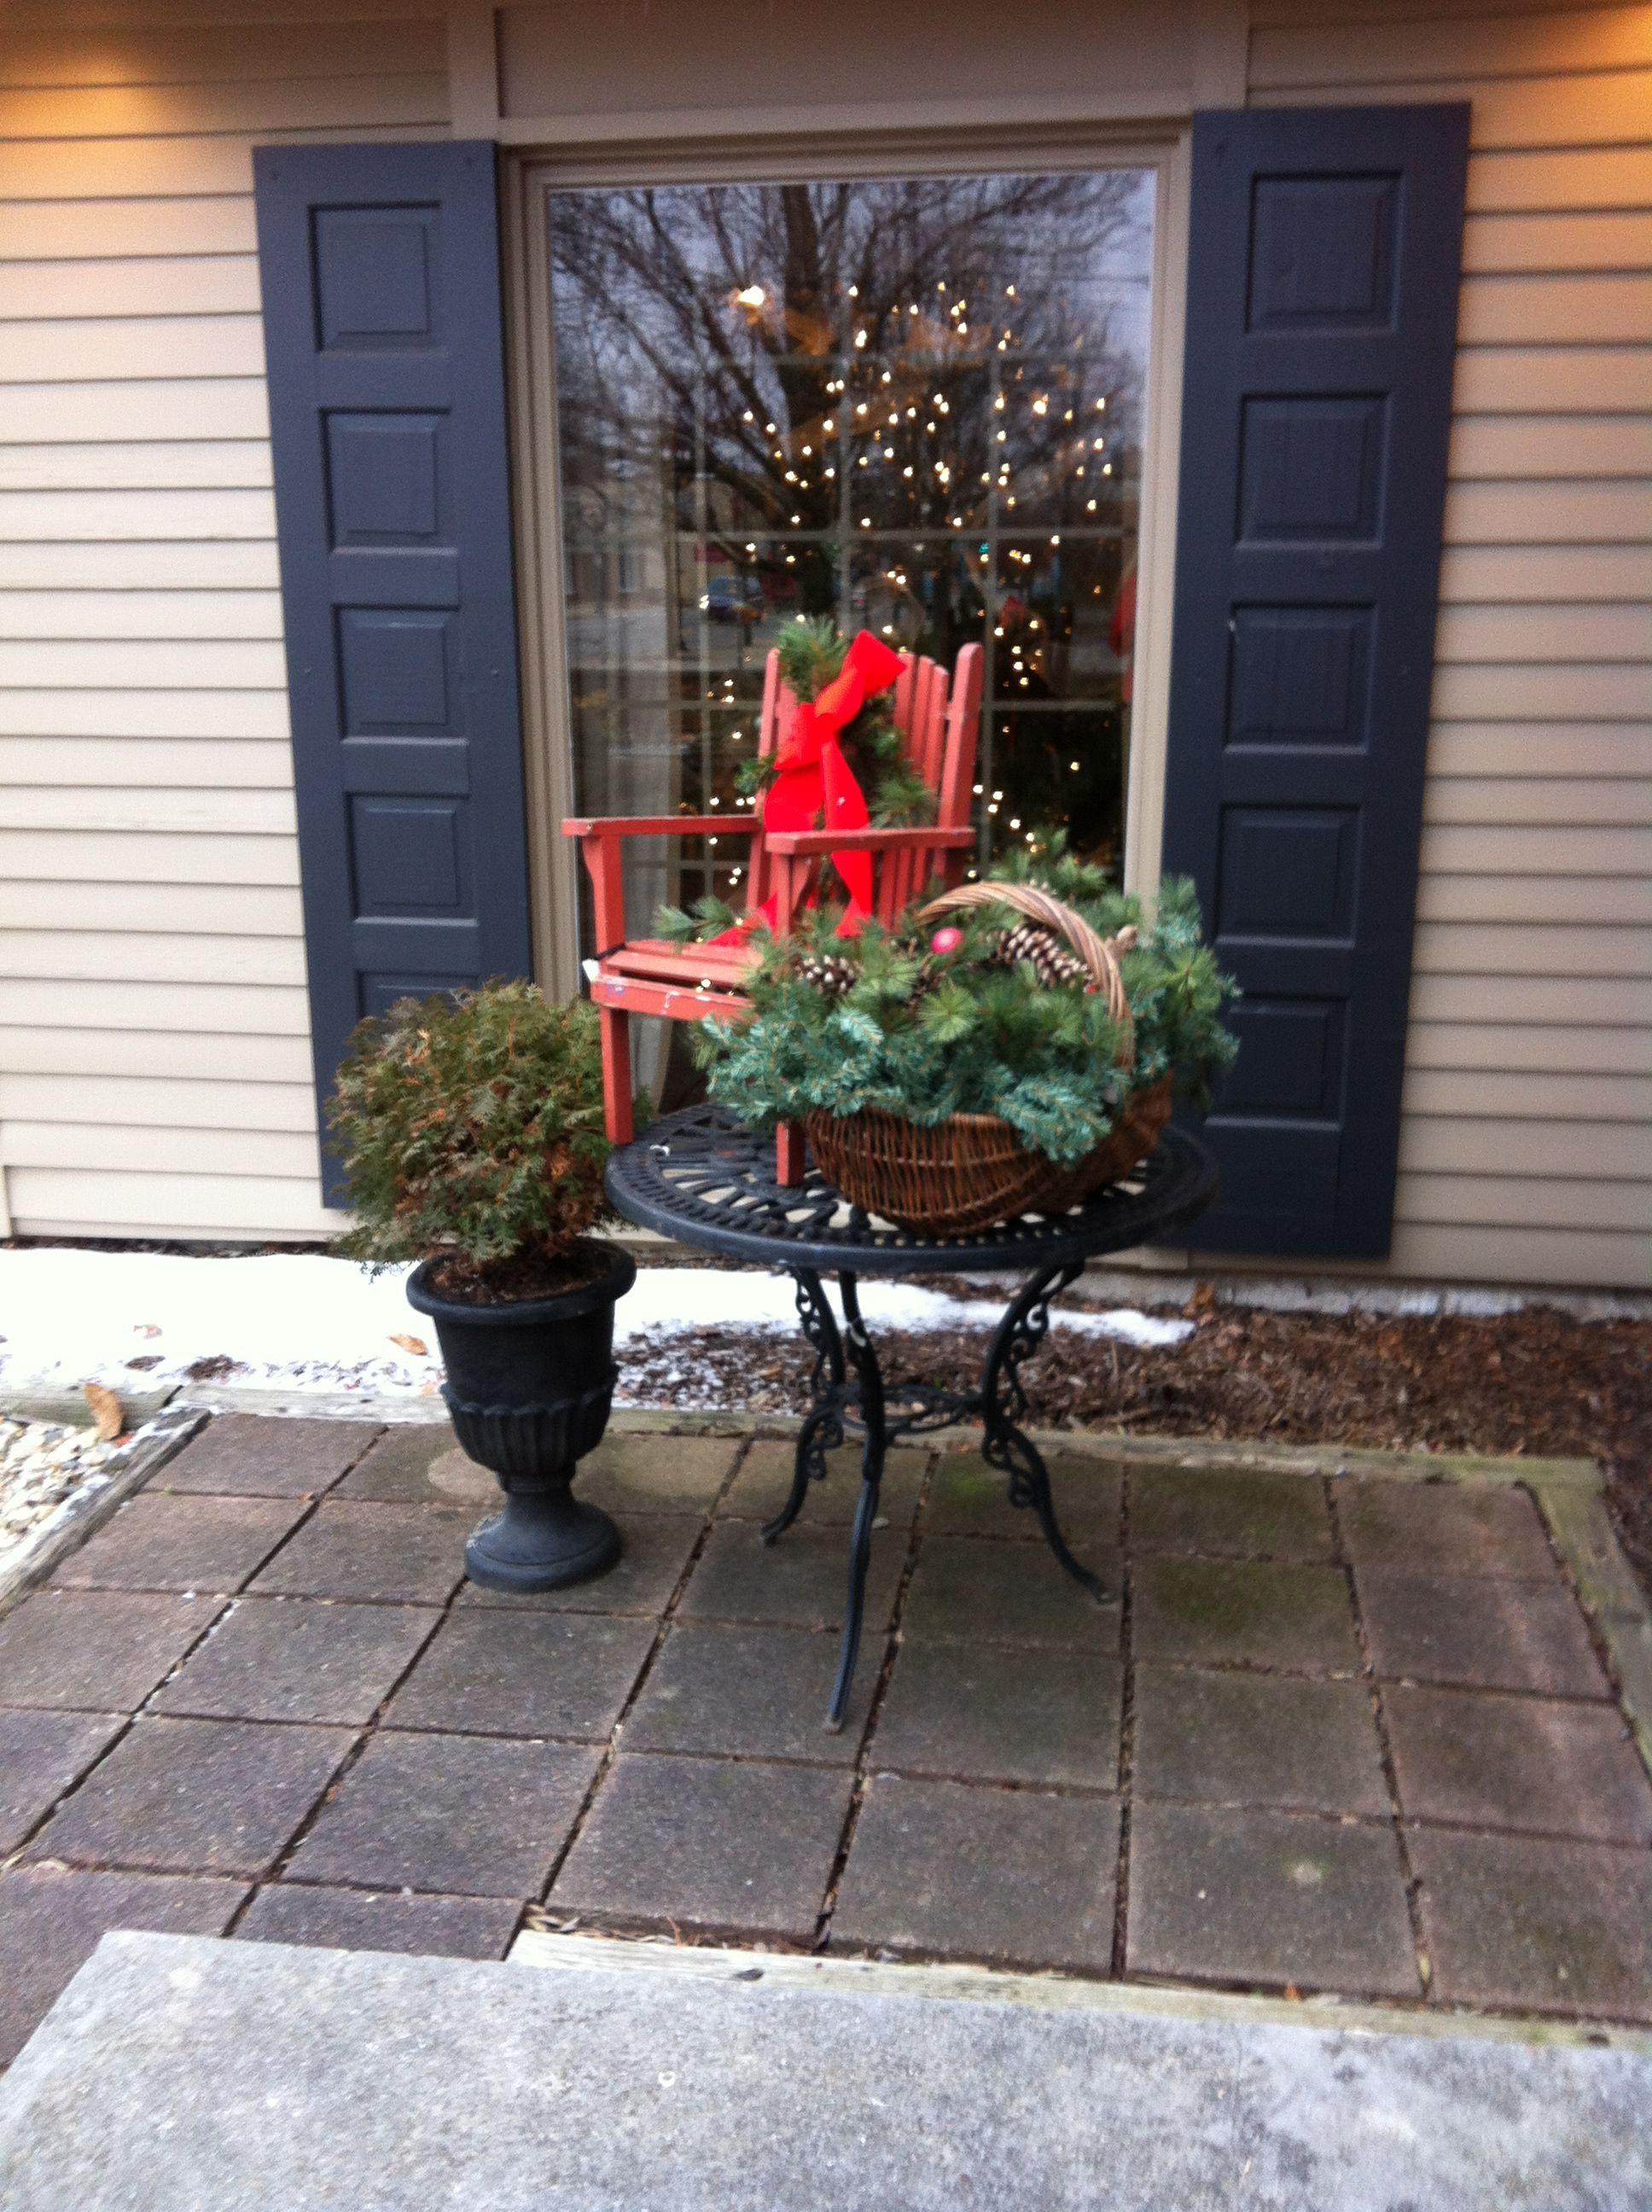 Vintage Backyard Decor : Outdoor vintage decor  christmas decor  Pinterest